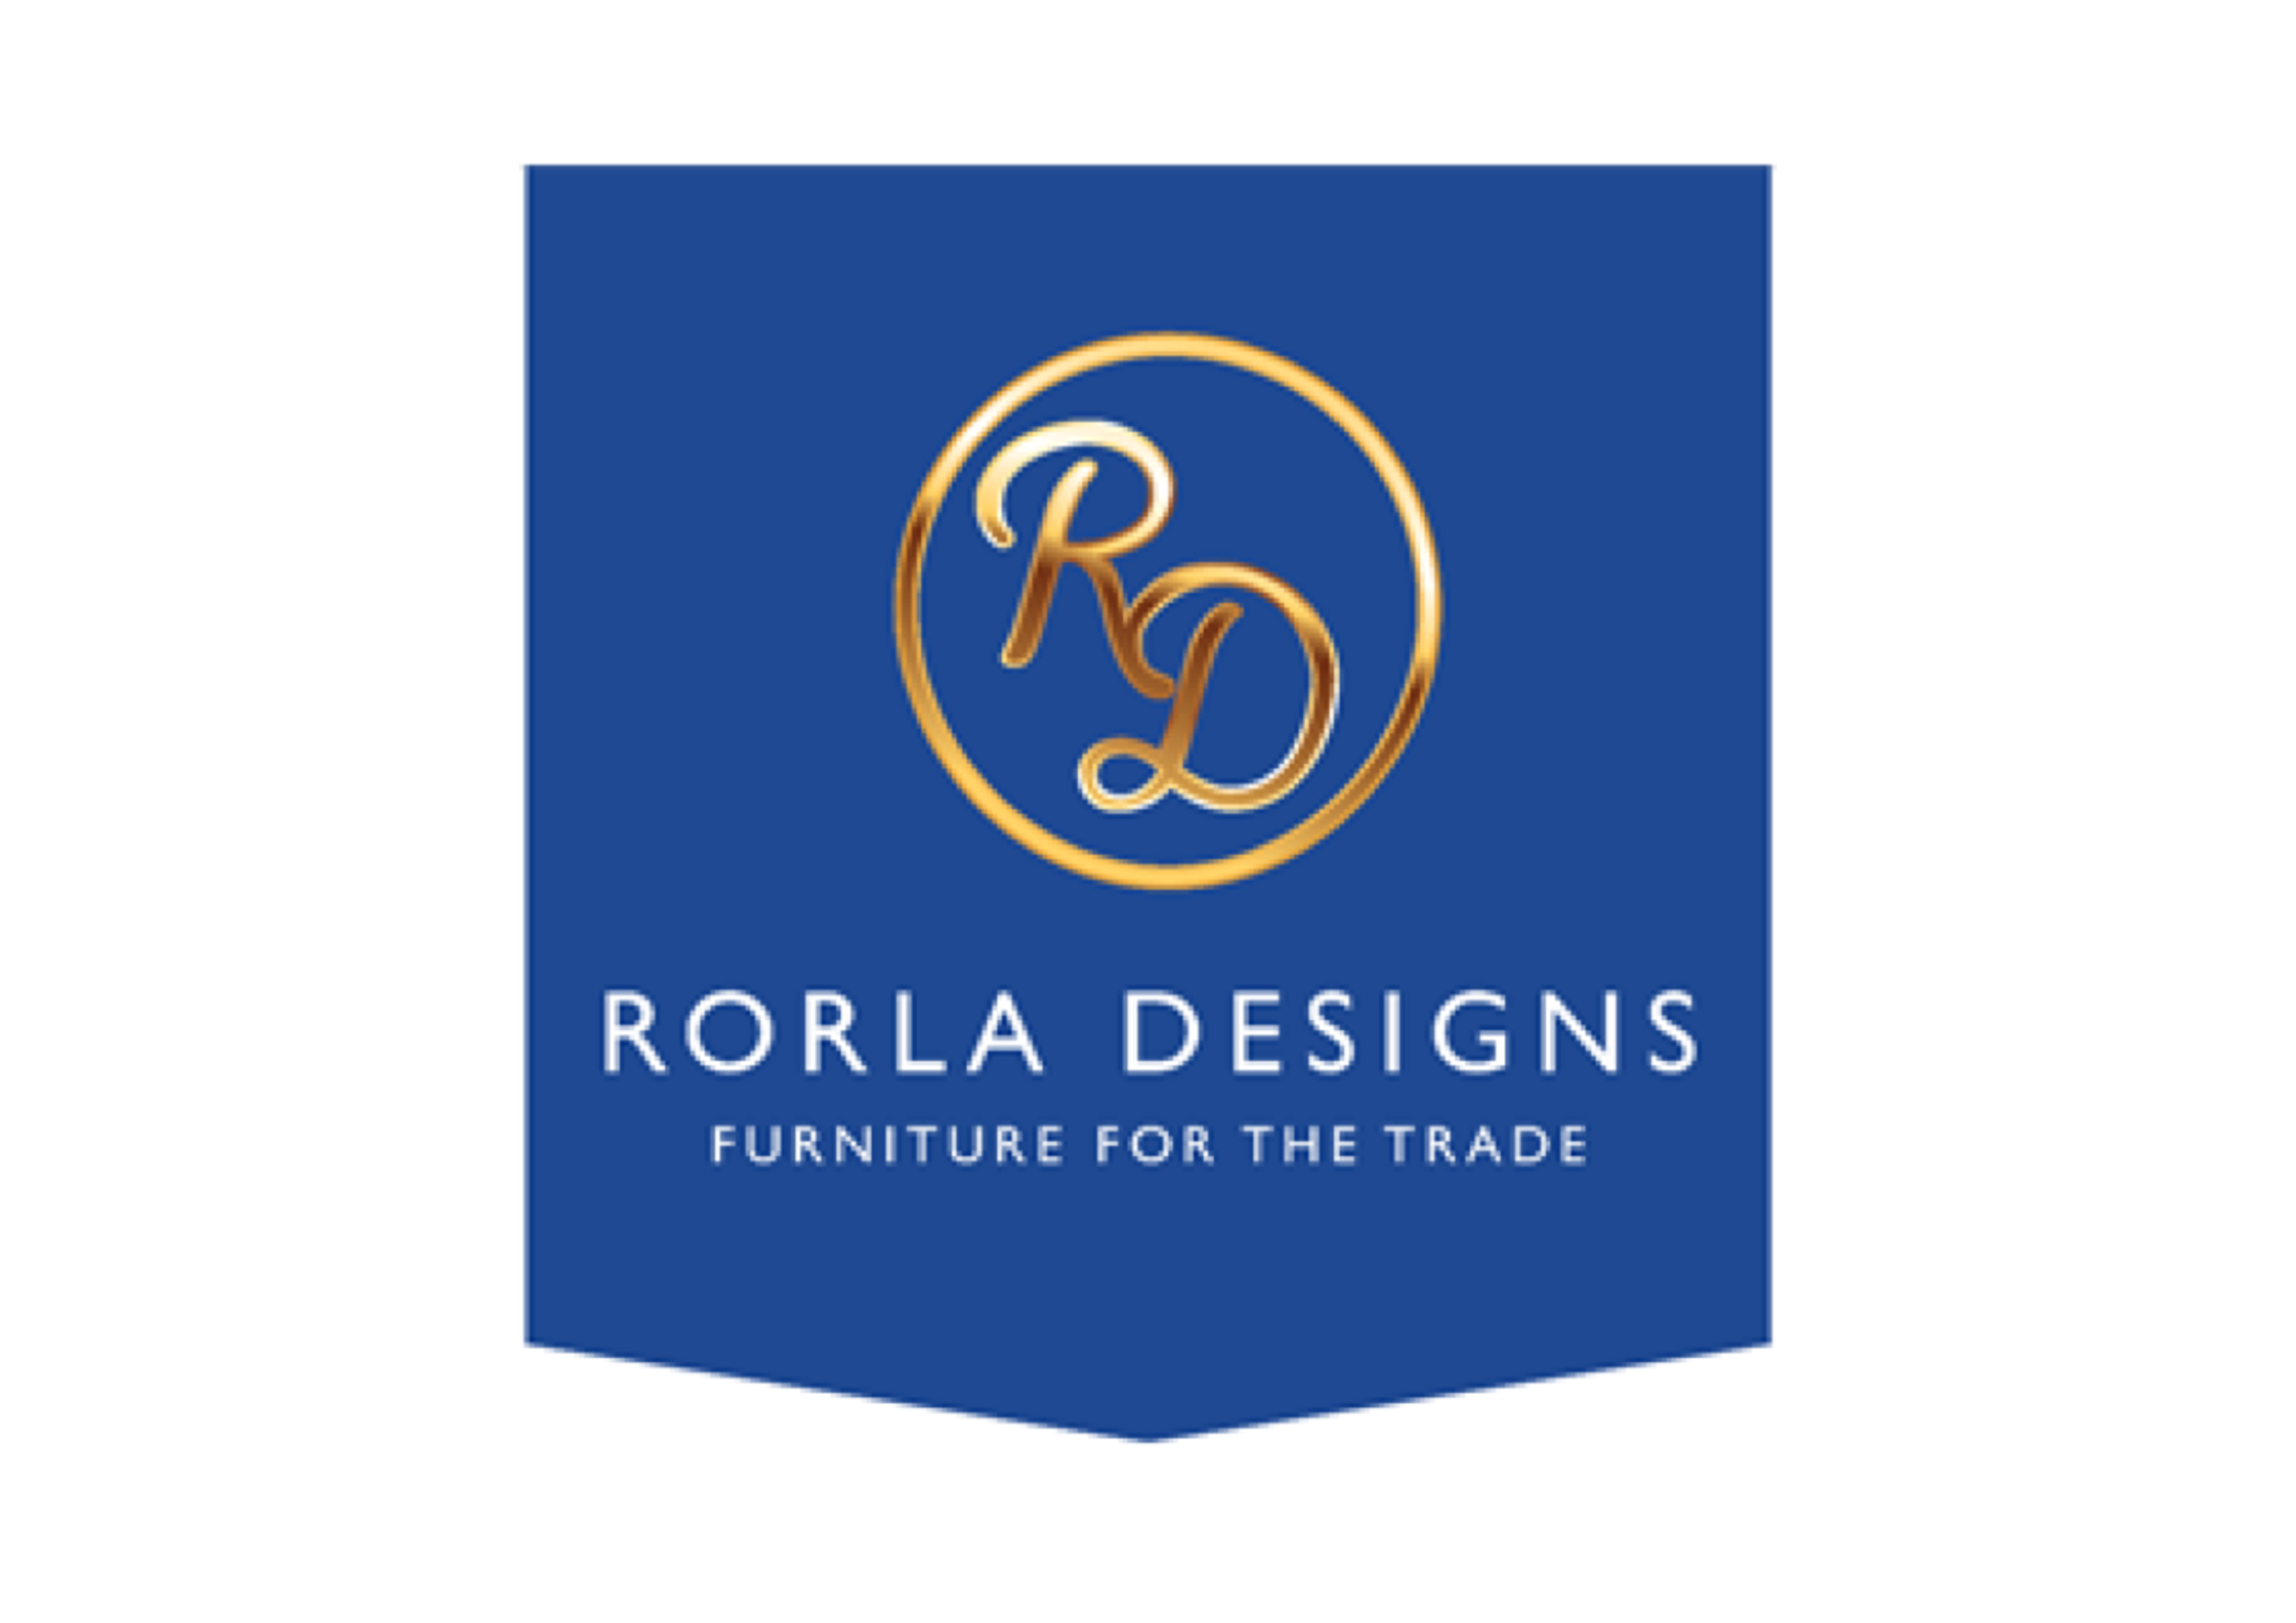 Rorla designs funding